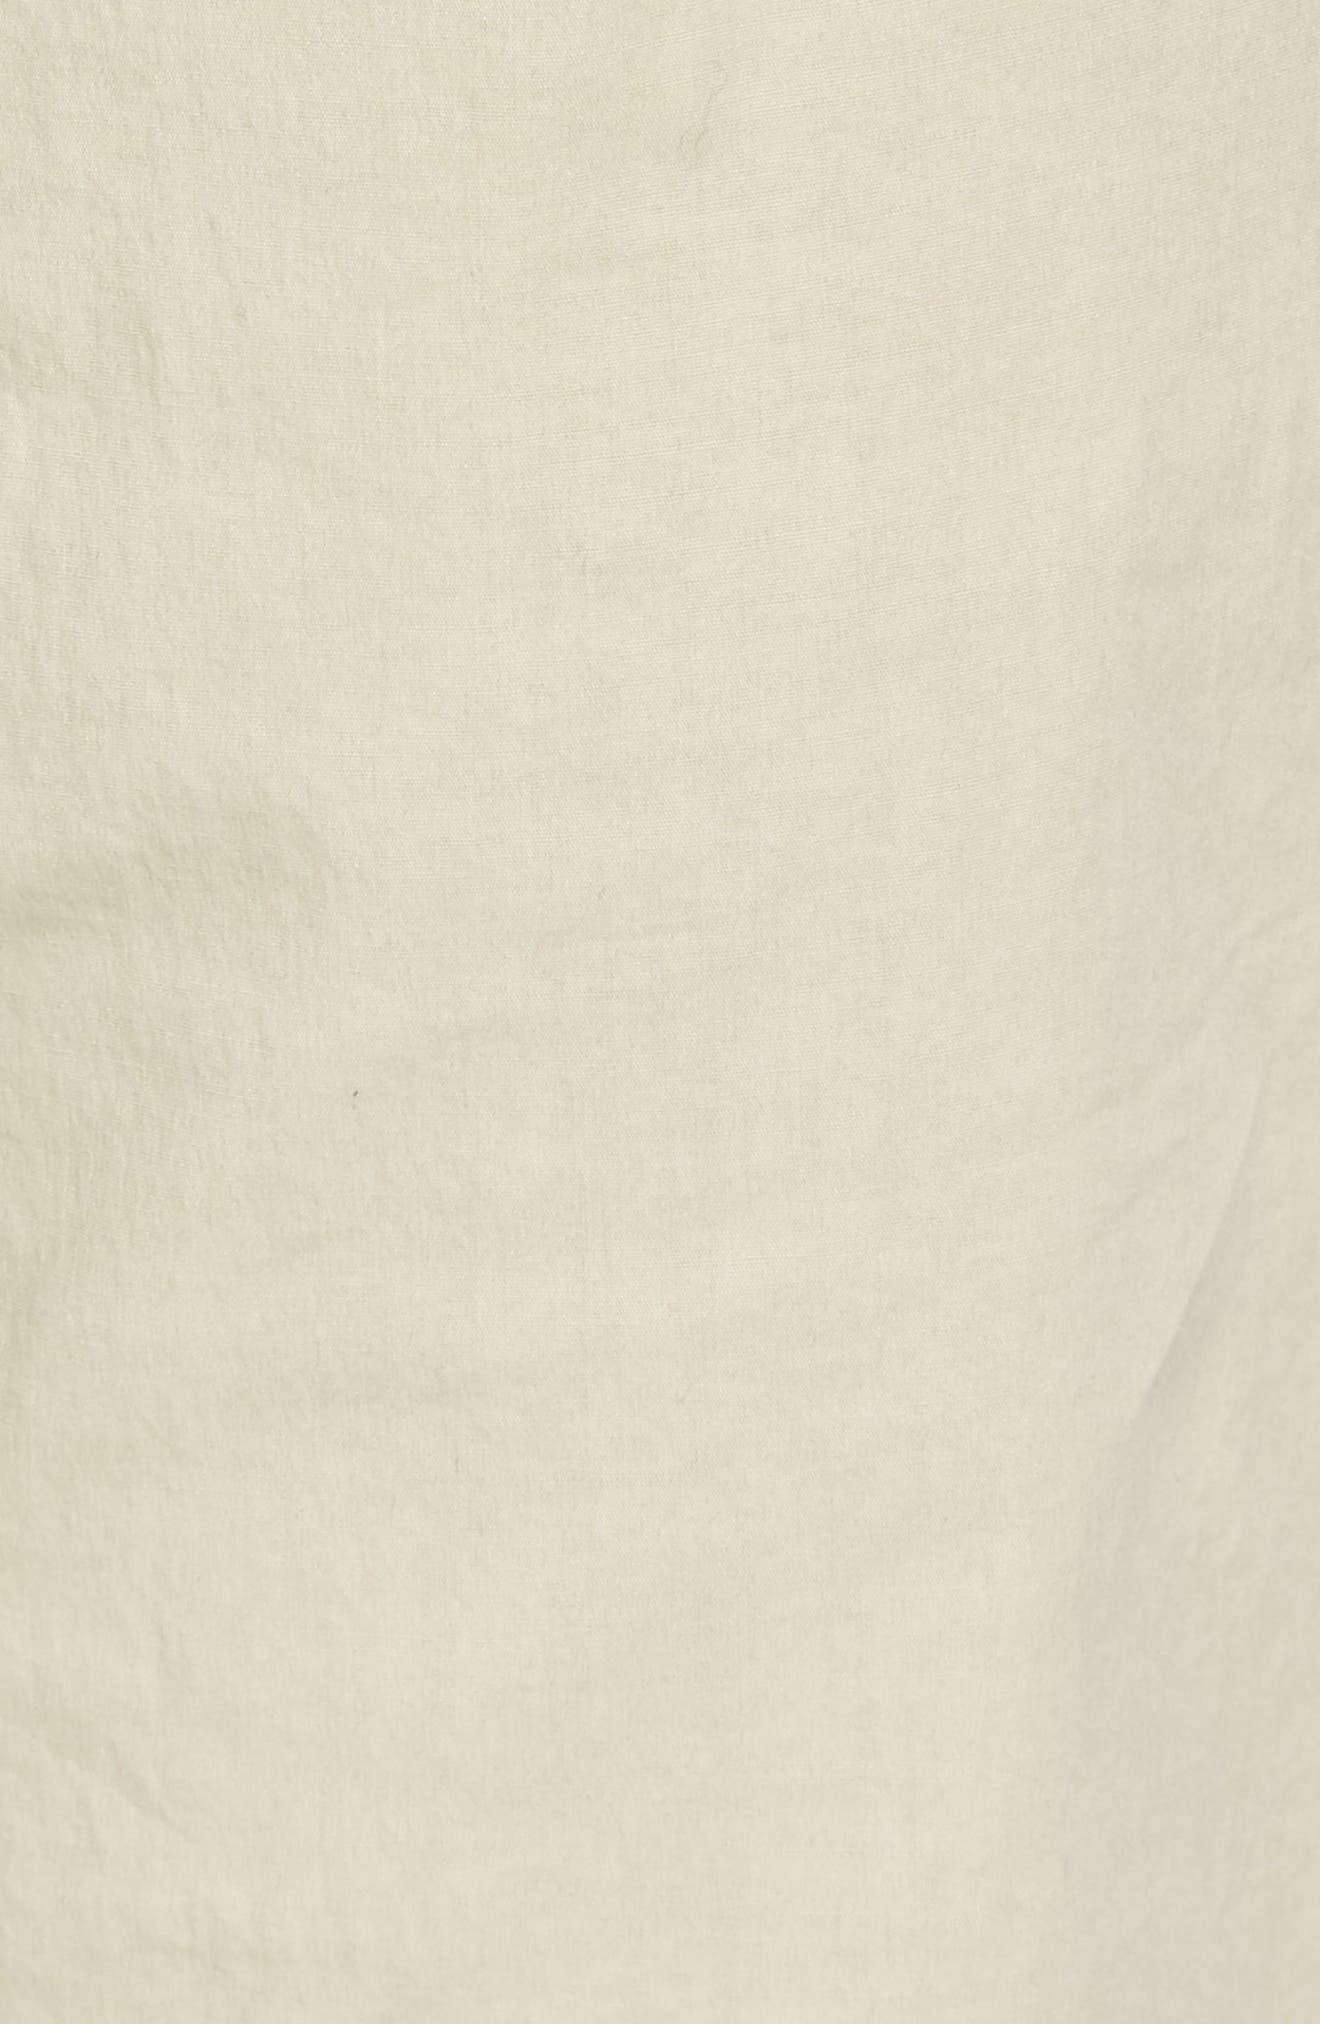 Slim Stretch Poplin Drawcord Pants,                             Alternate thumbnail 20, color,